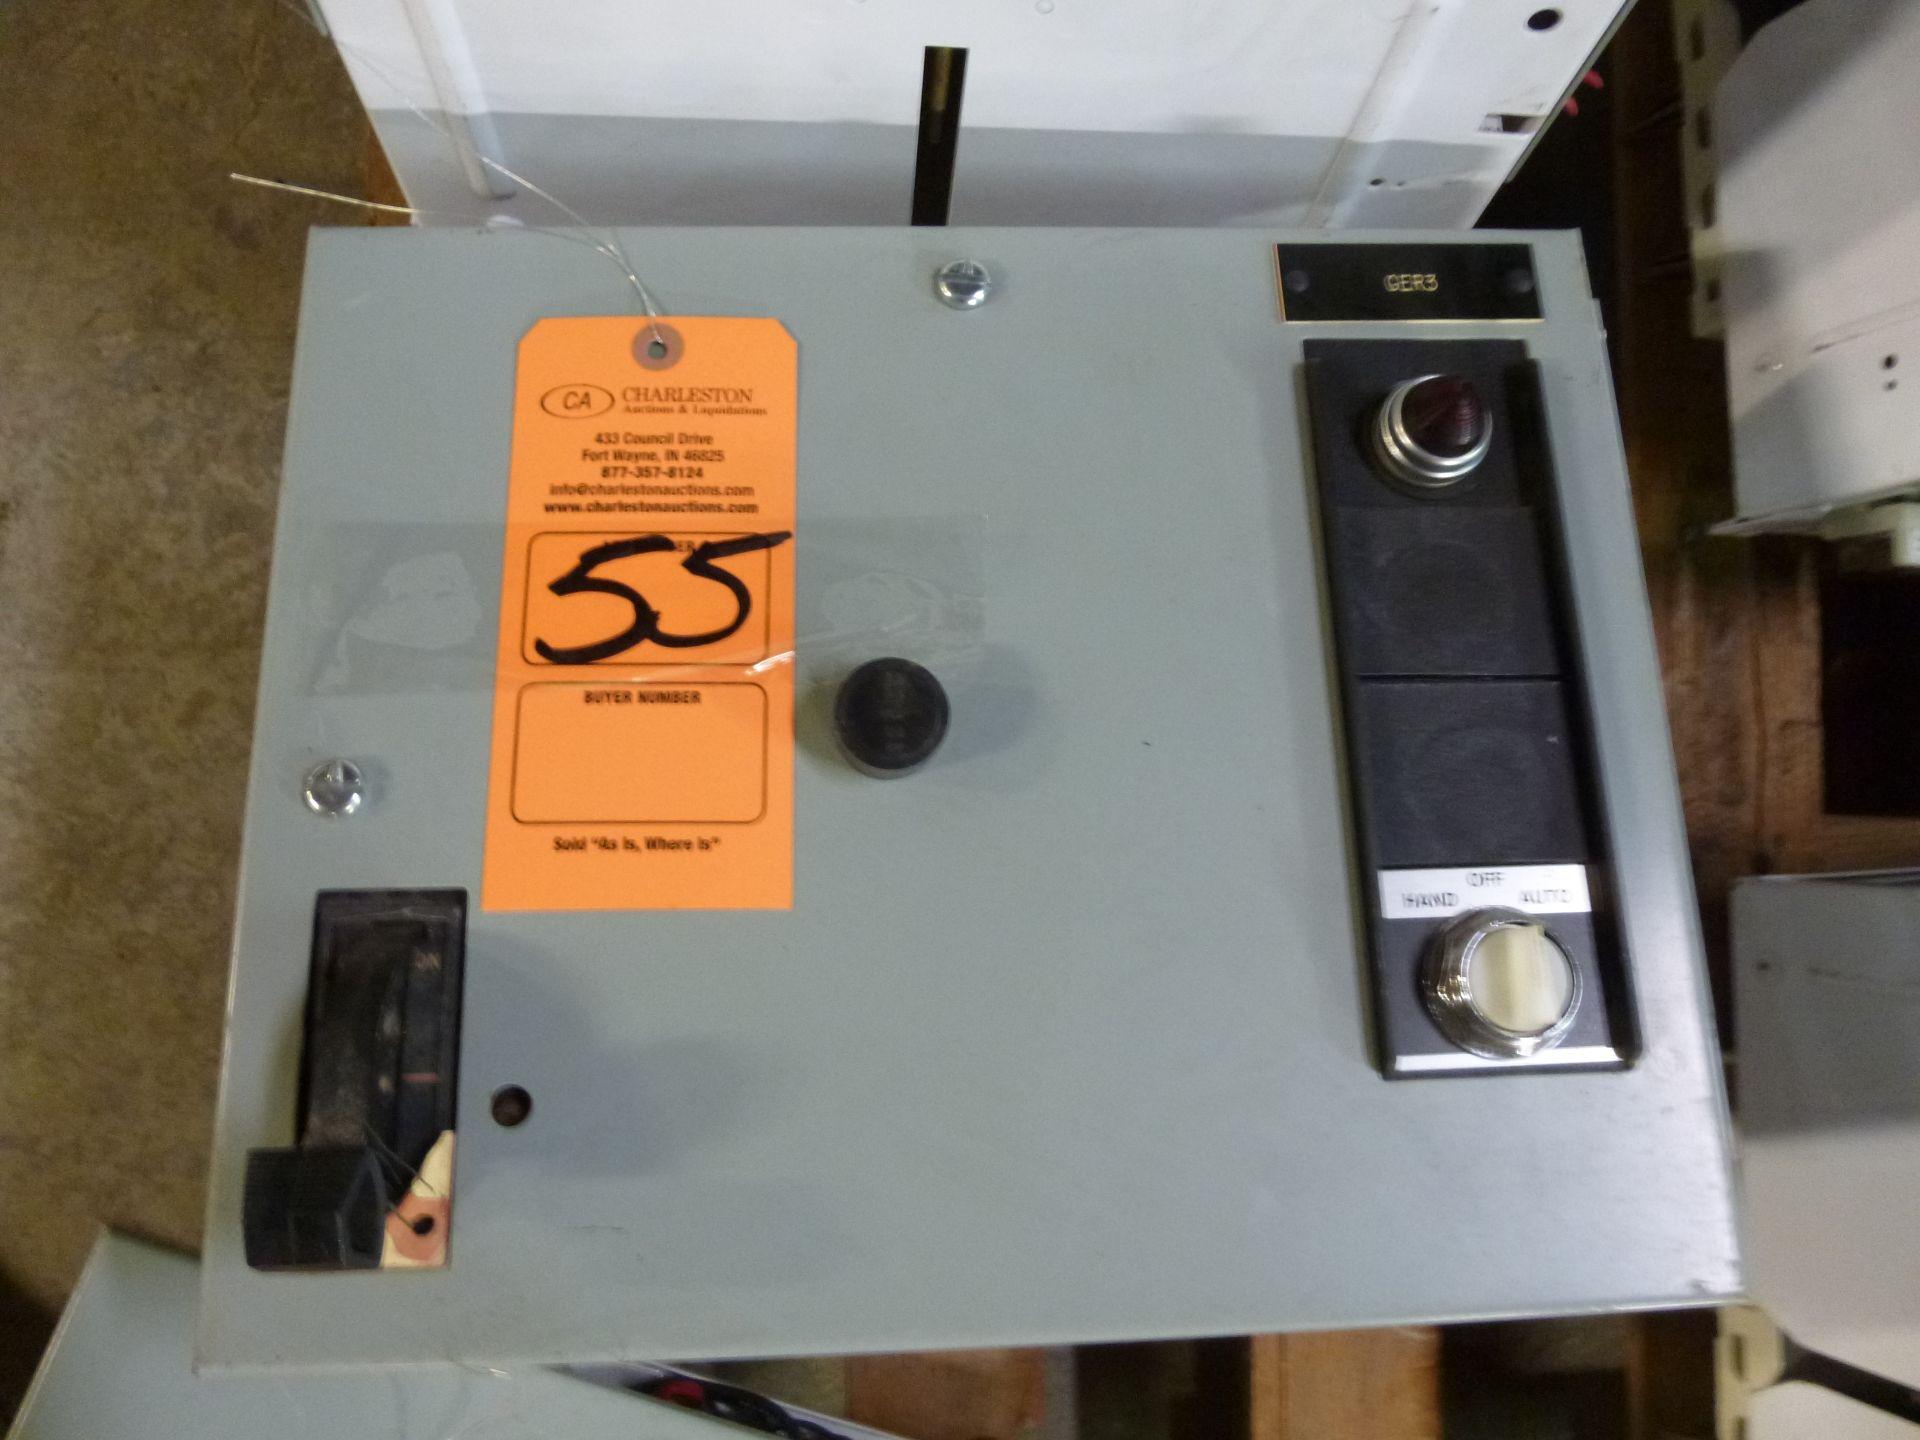 Lot 55 - GE motor control center MCC bucket model 8000, type FVNR, 3 phase, 208v, 2 hp, size 1 bucket,